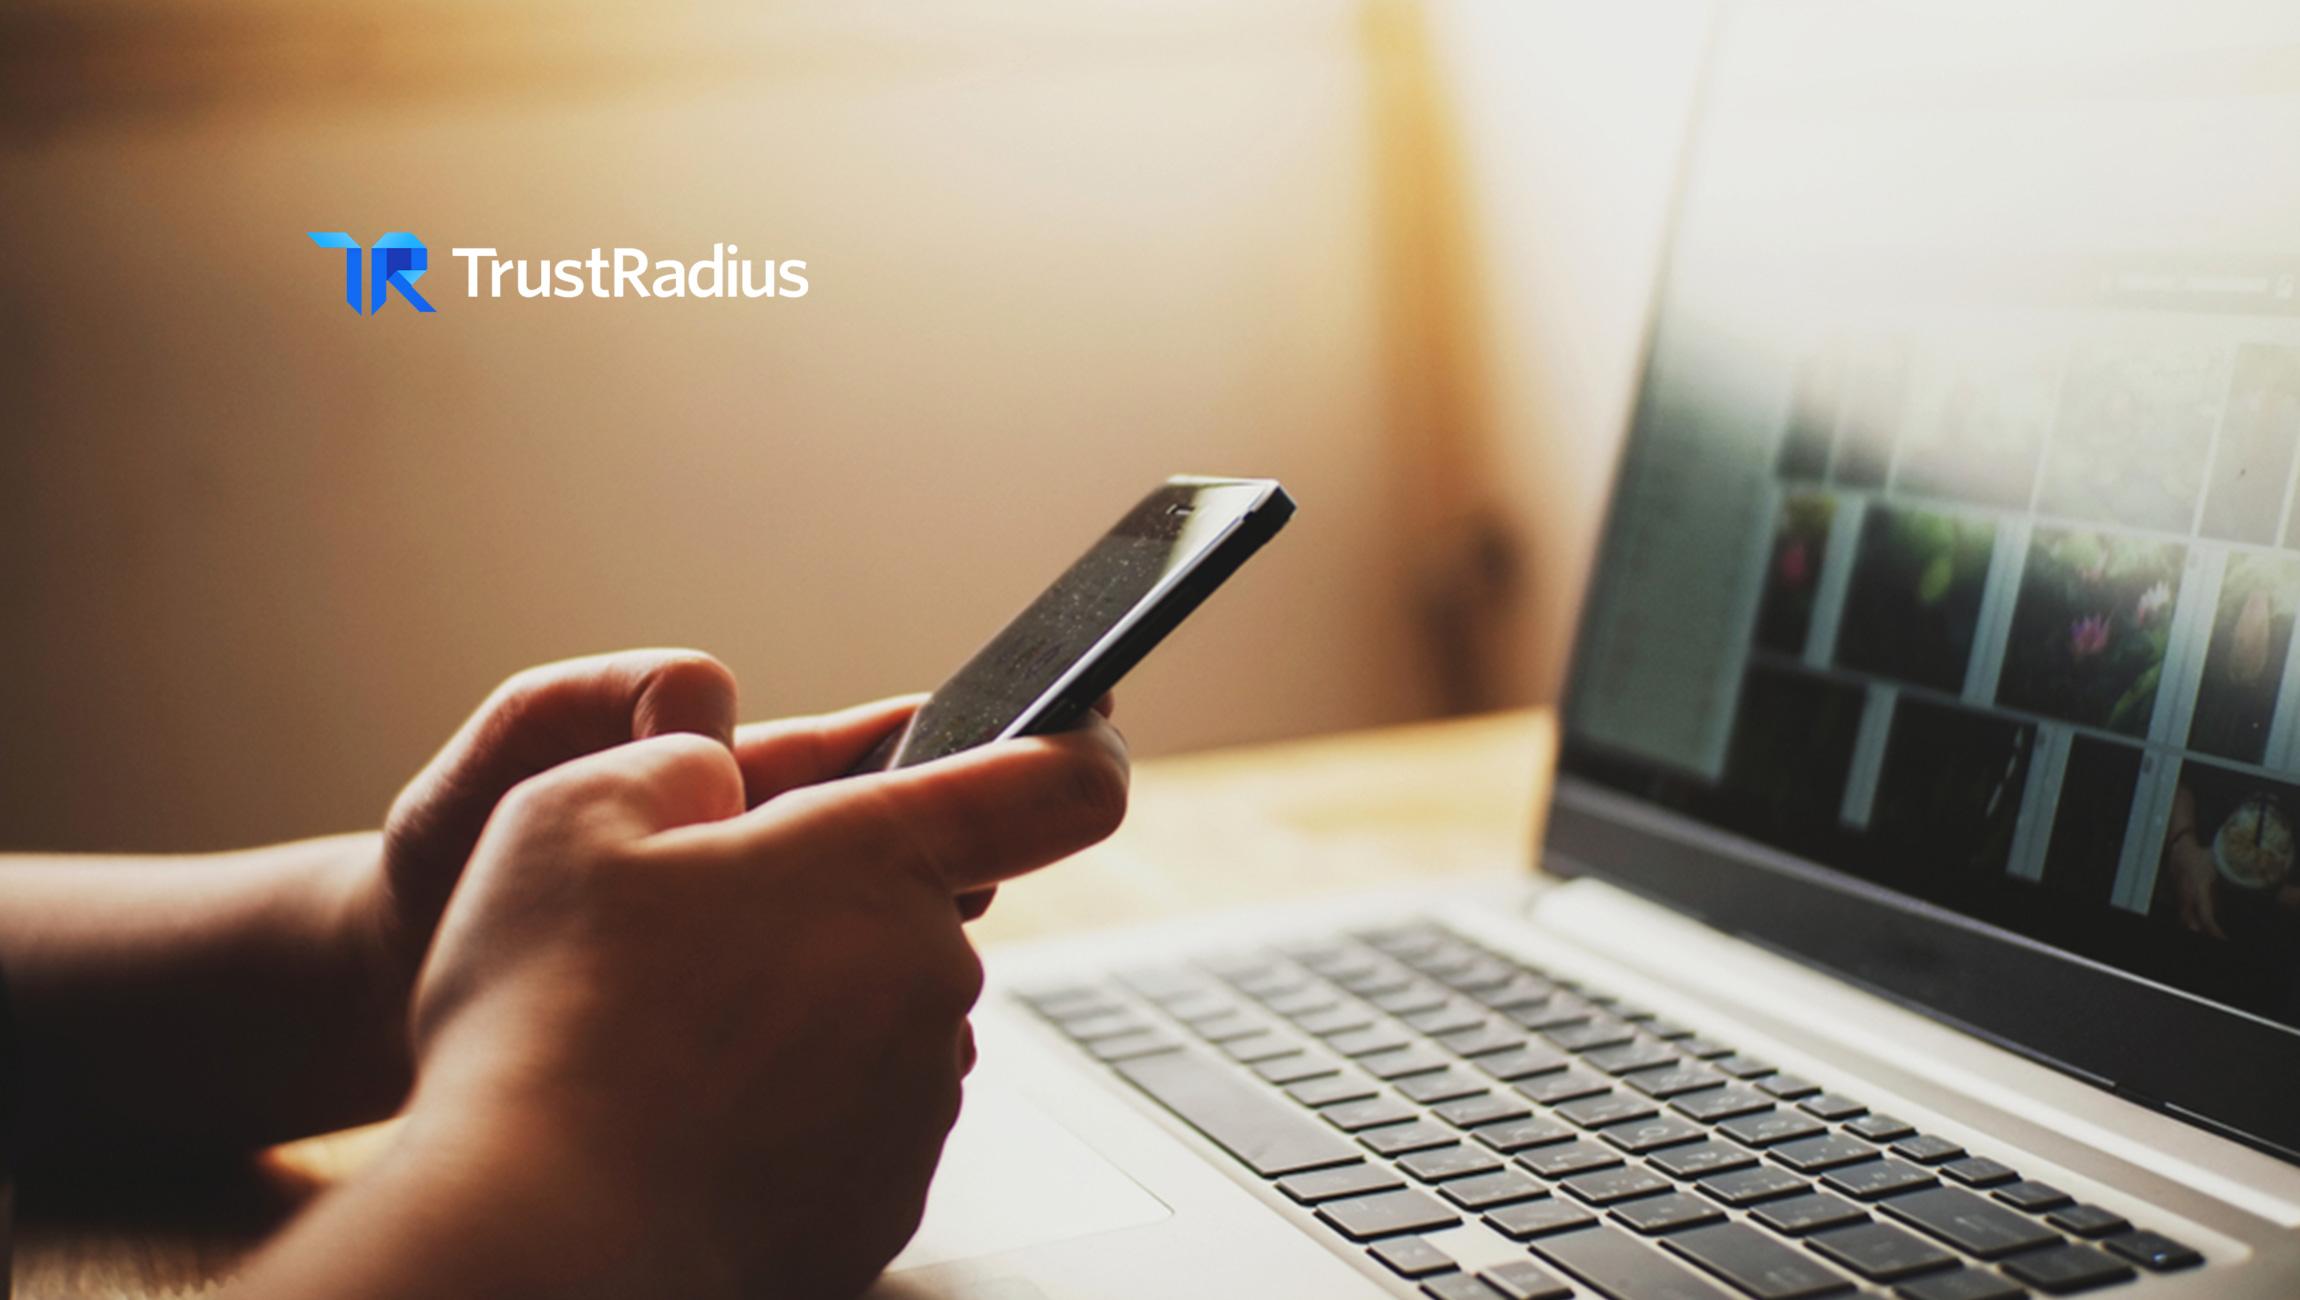 TrustRadius Raises $12.5 Million to Revolutionize Software Reviews for Enterprise